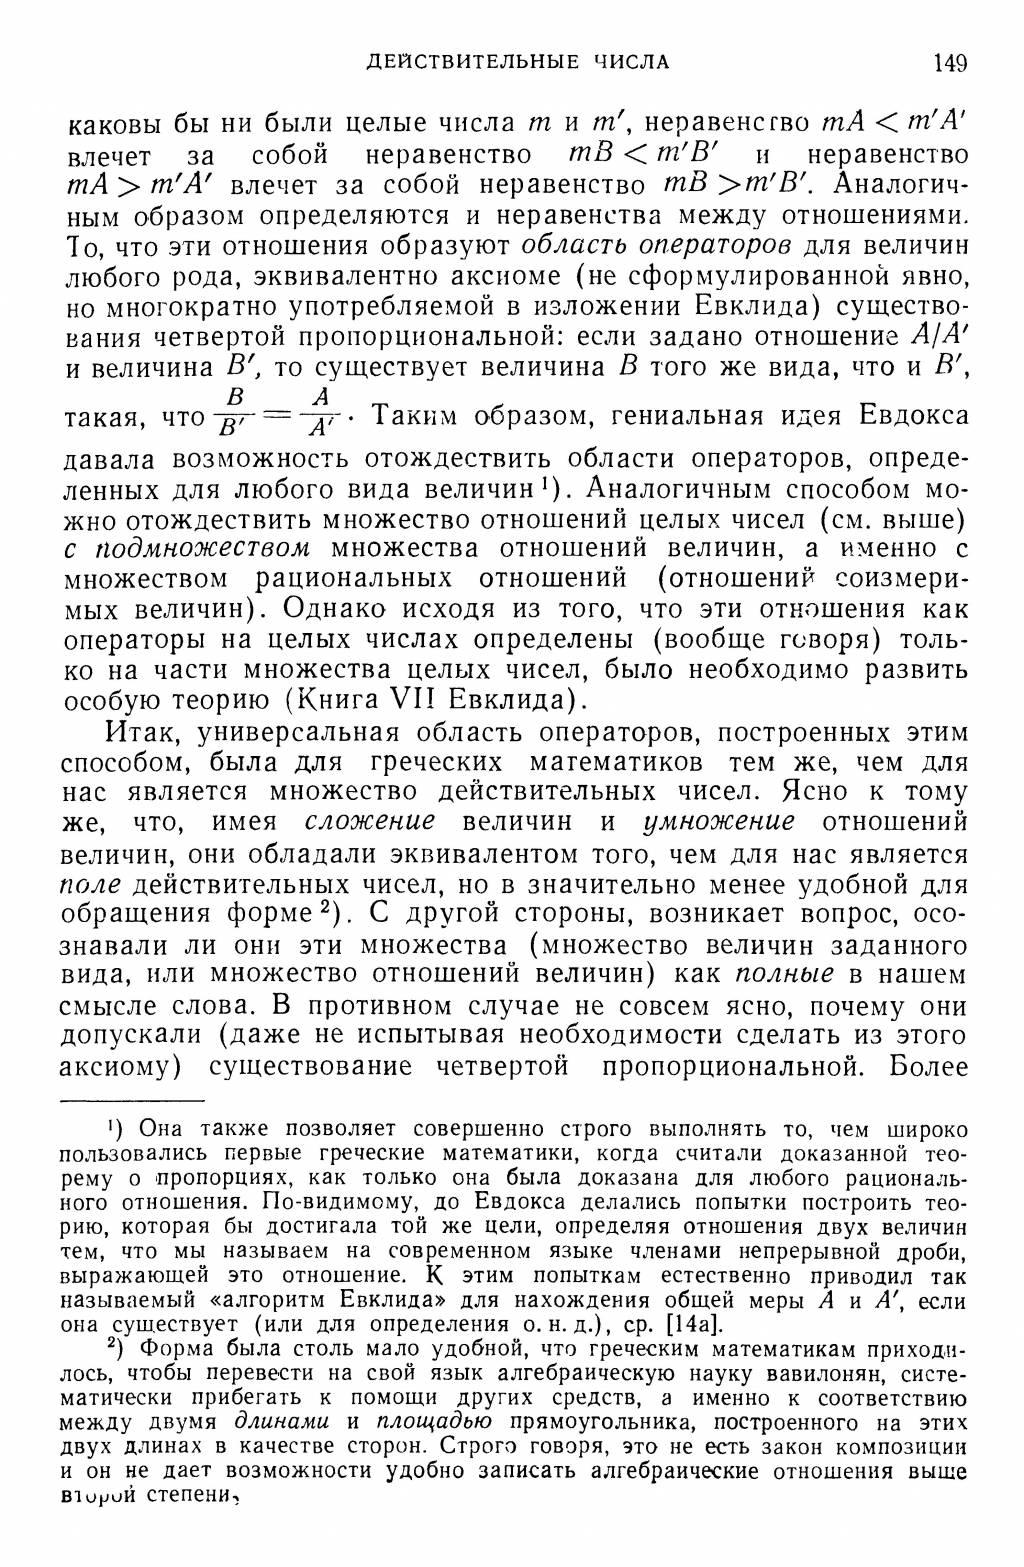 p0149.jpg